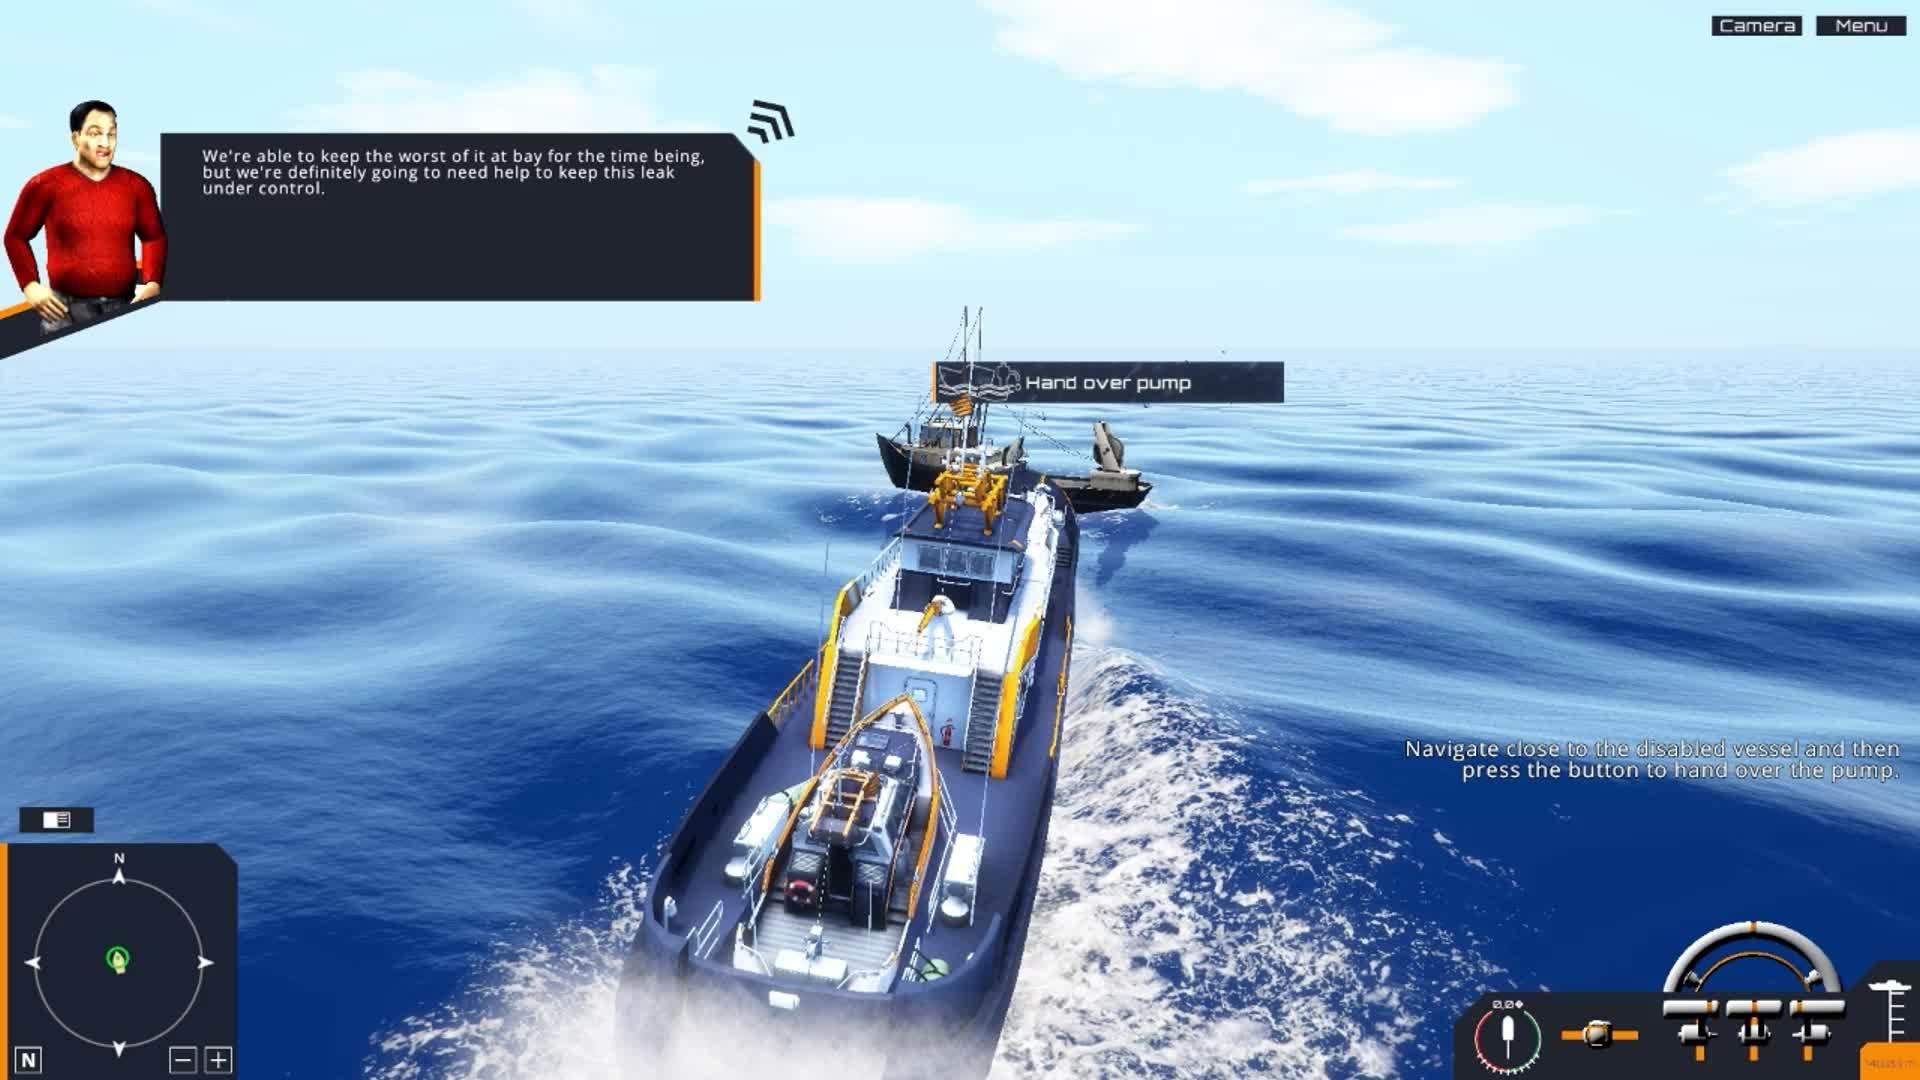 gamephysics, Coast Guard ship attempts to help fishing boat GIFs